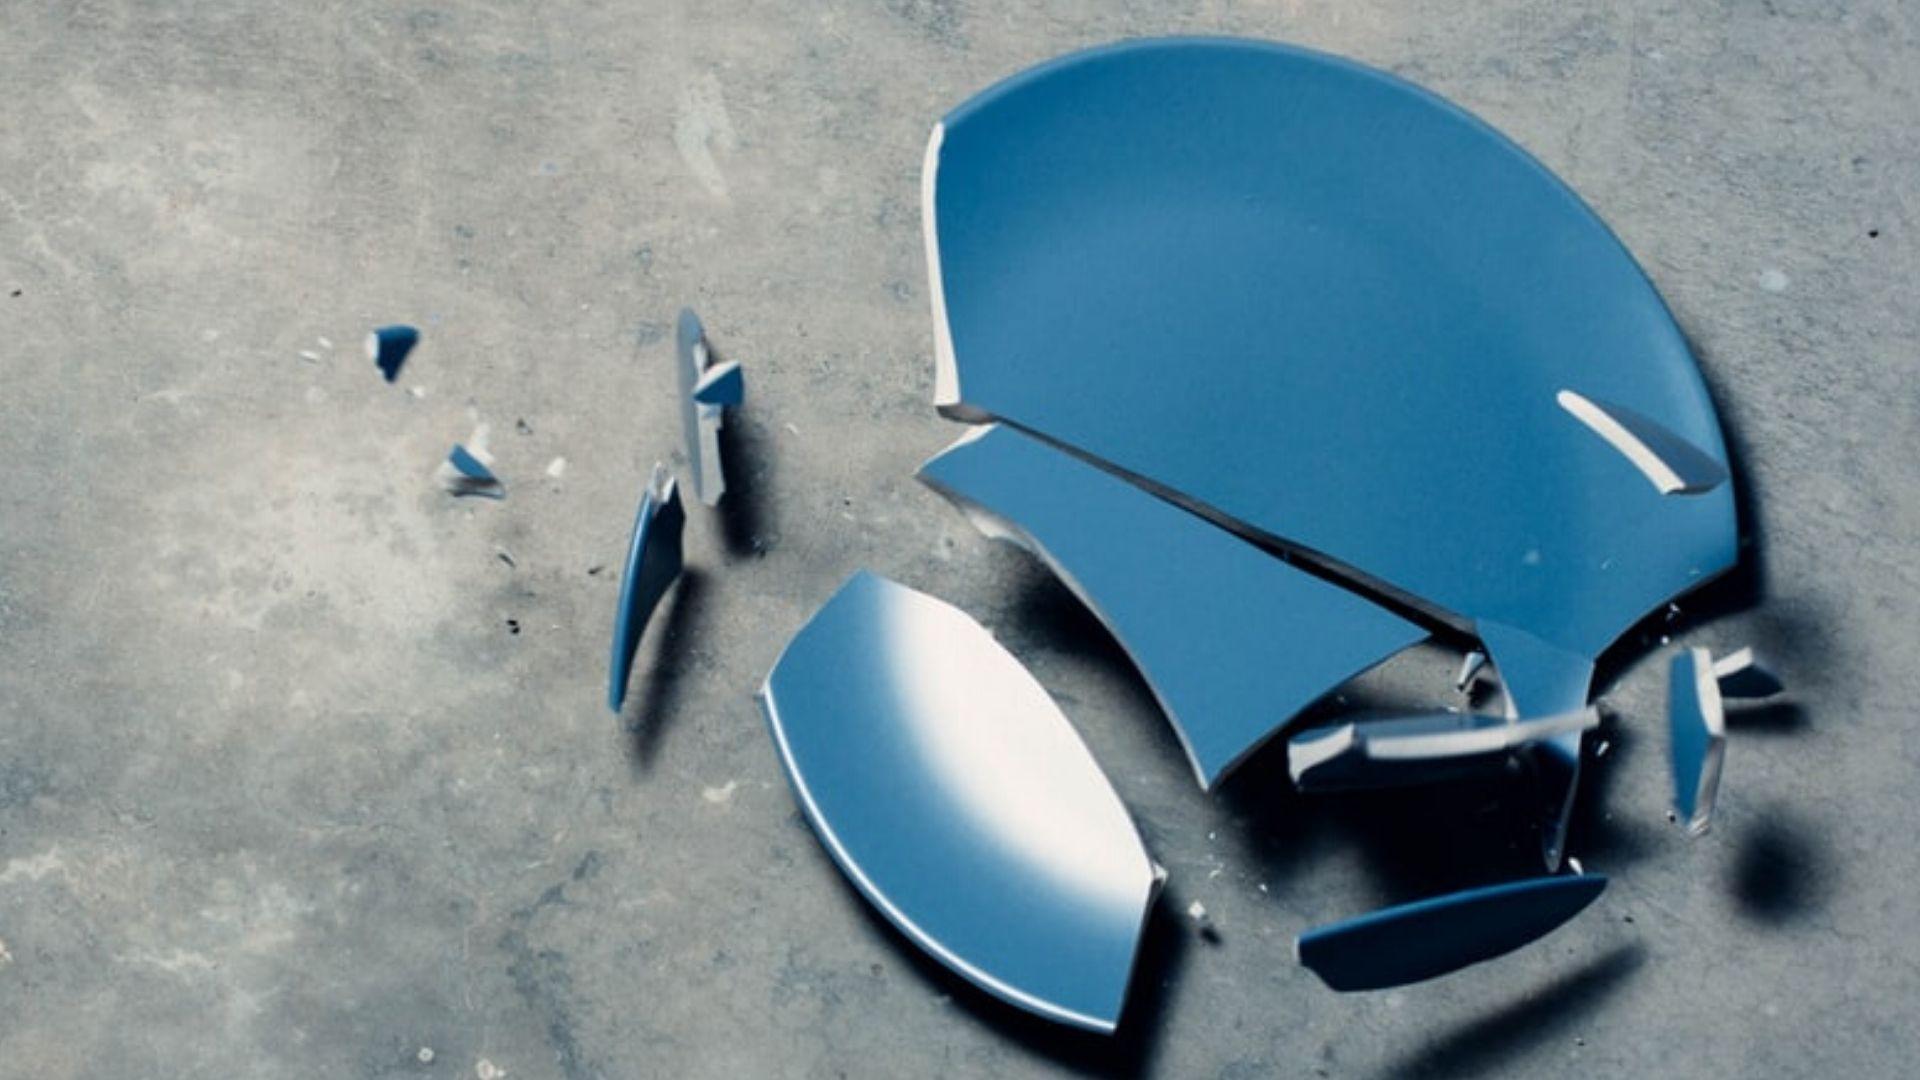 broken plate on ground breaking bd habits ritual